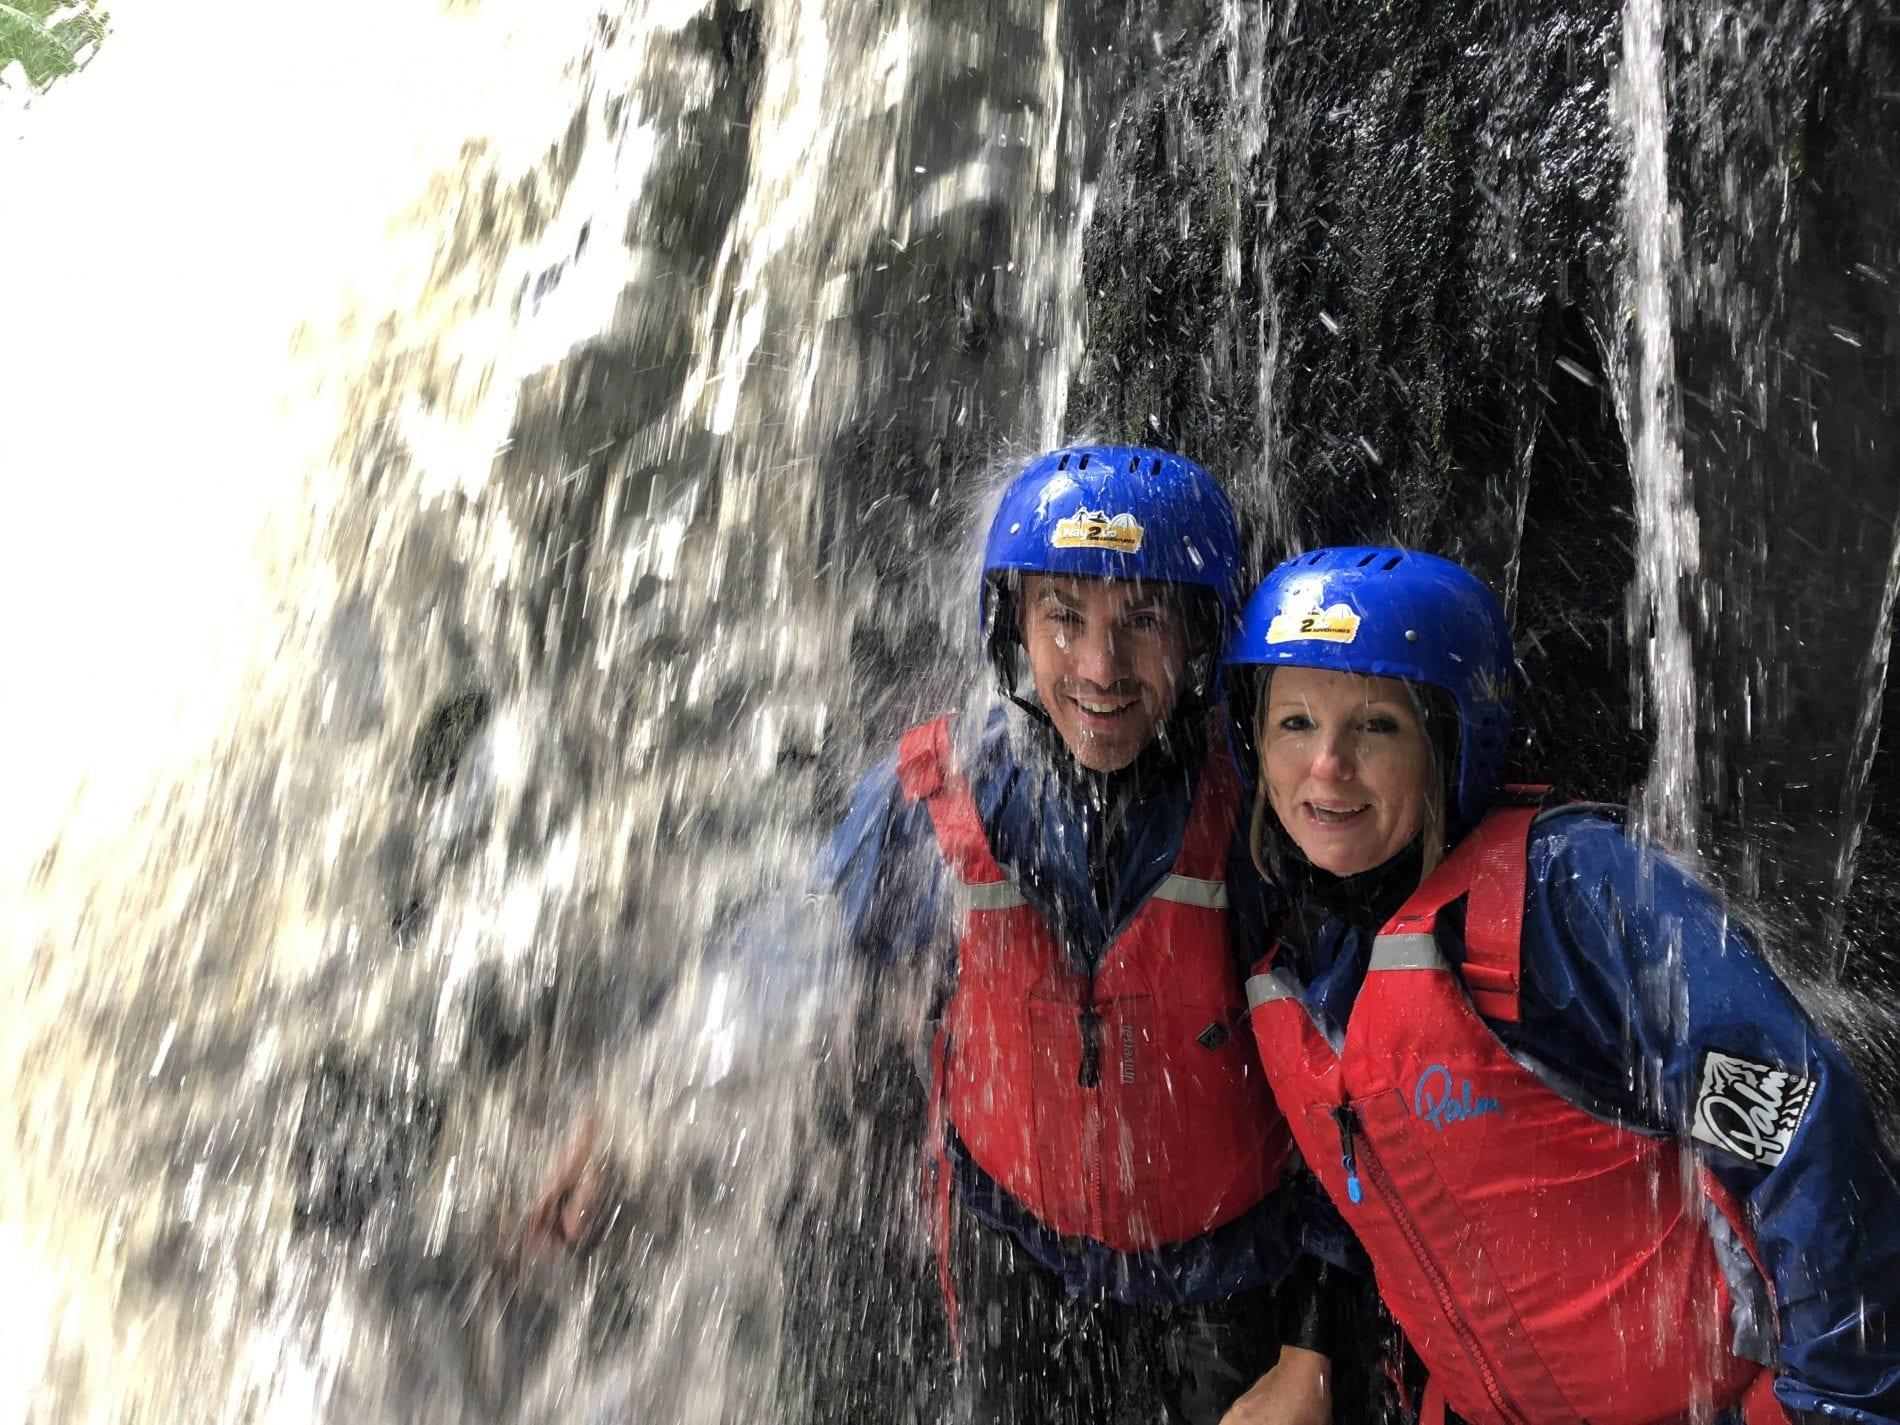 Way2Go Adventures - Gorge Walking - Brecon Beacons